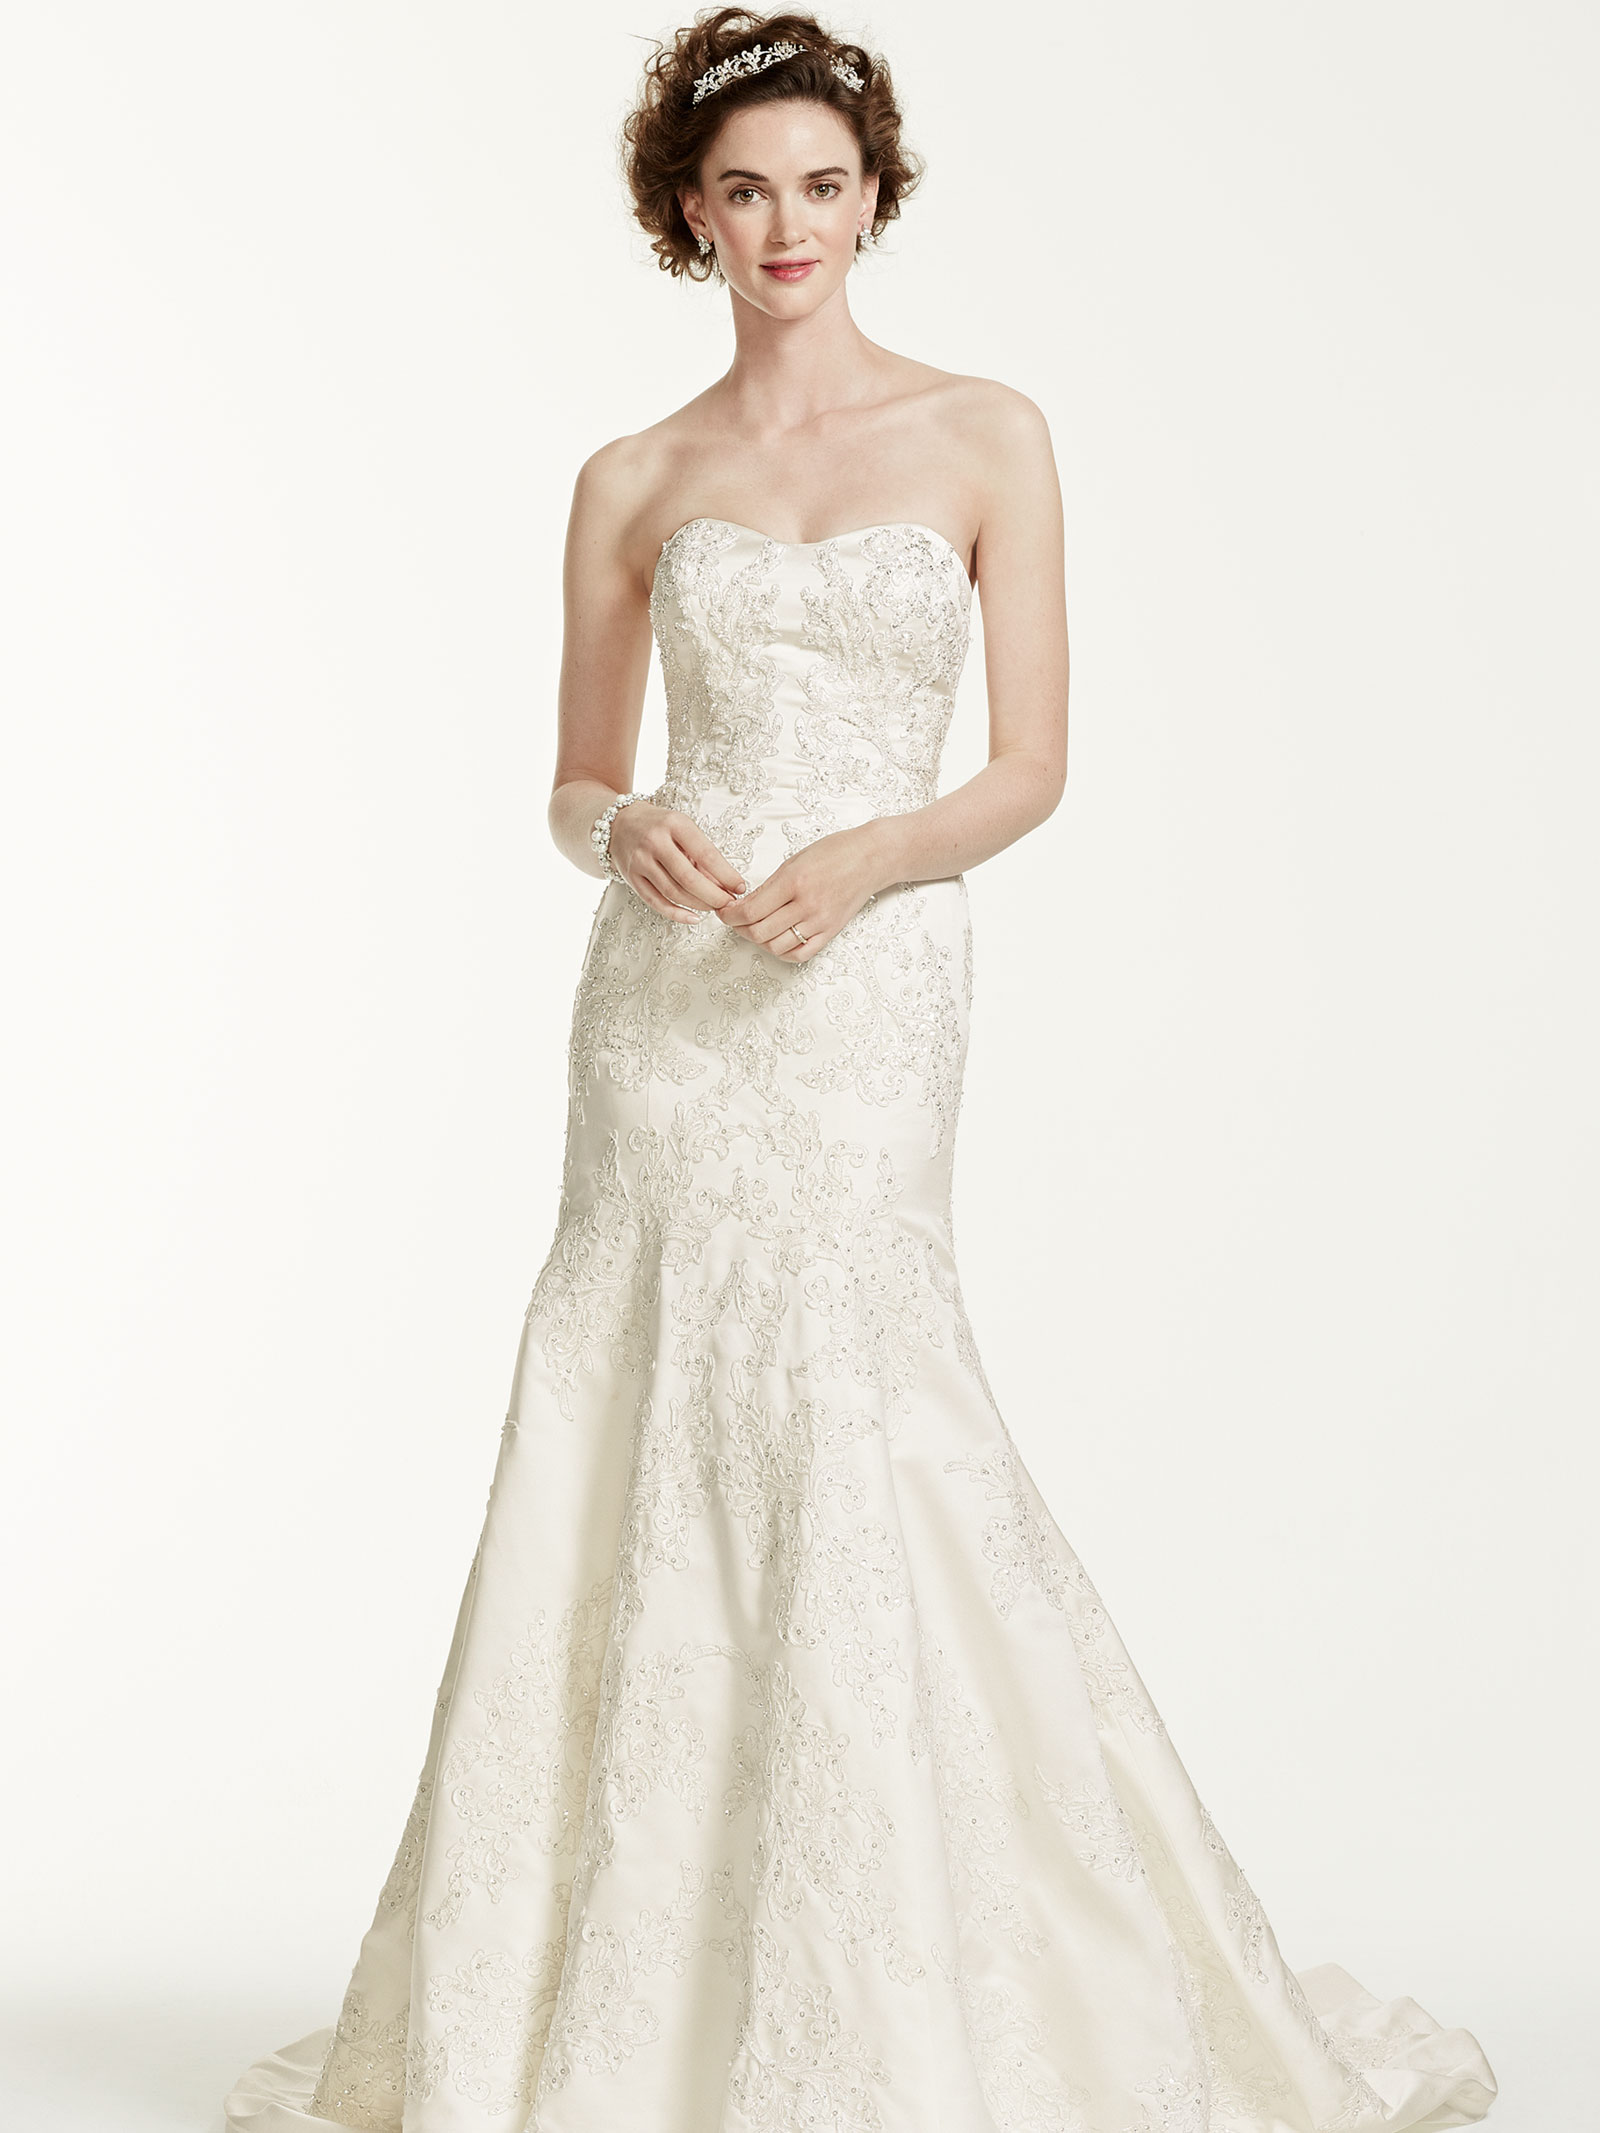 87ec7461286b Silhouette: Trumpet. Style: Strapless. Train: Sweep. Oleg Cassini at  David's Bridal CWG594 wedding dress